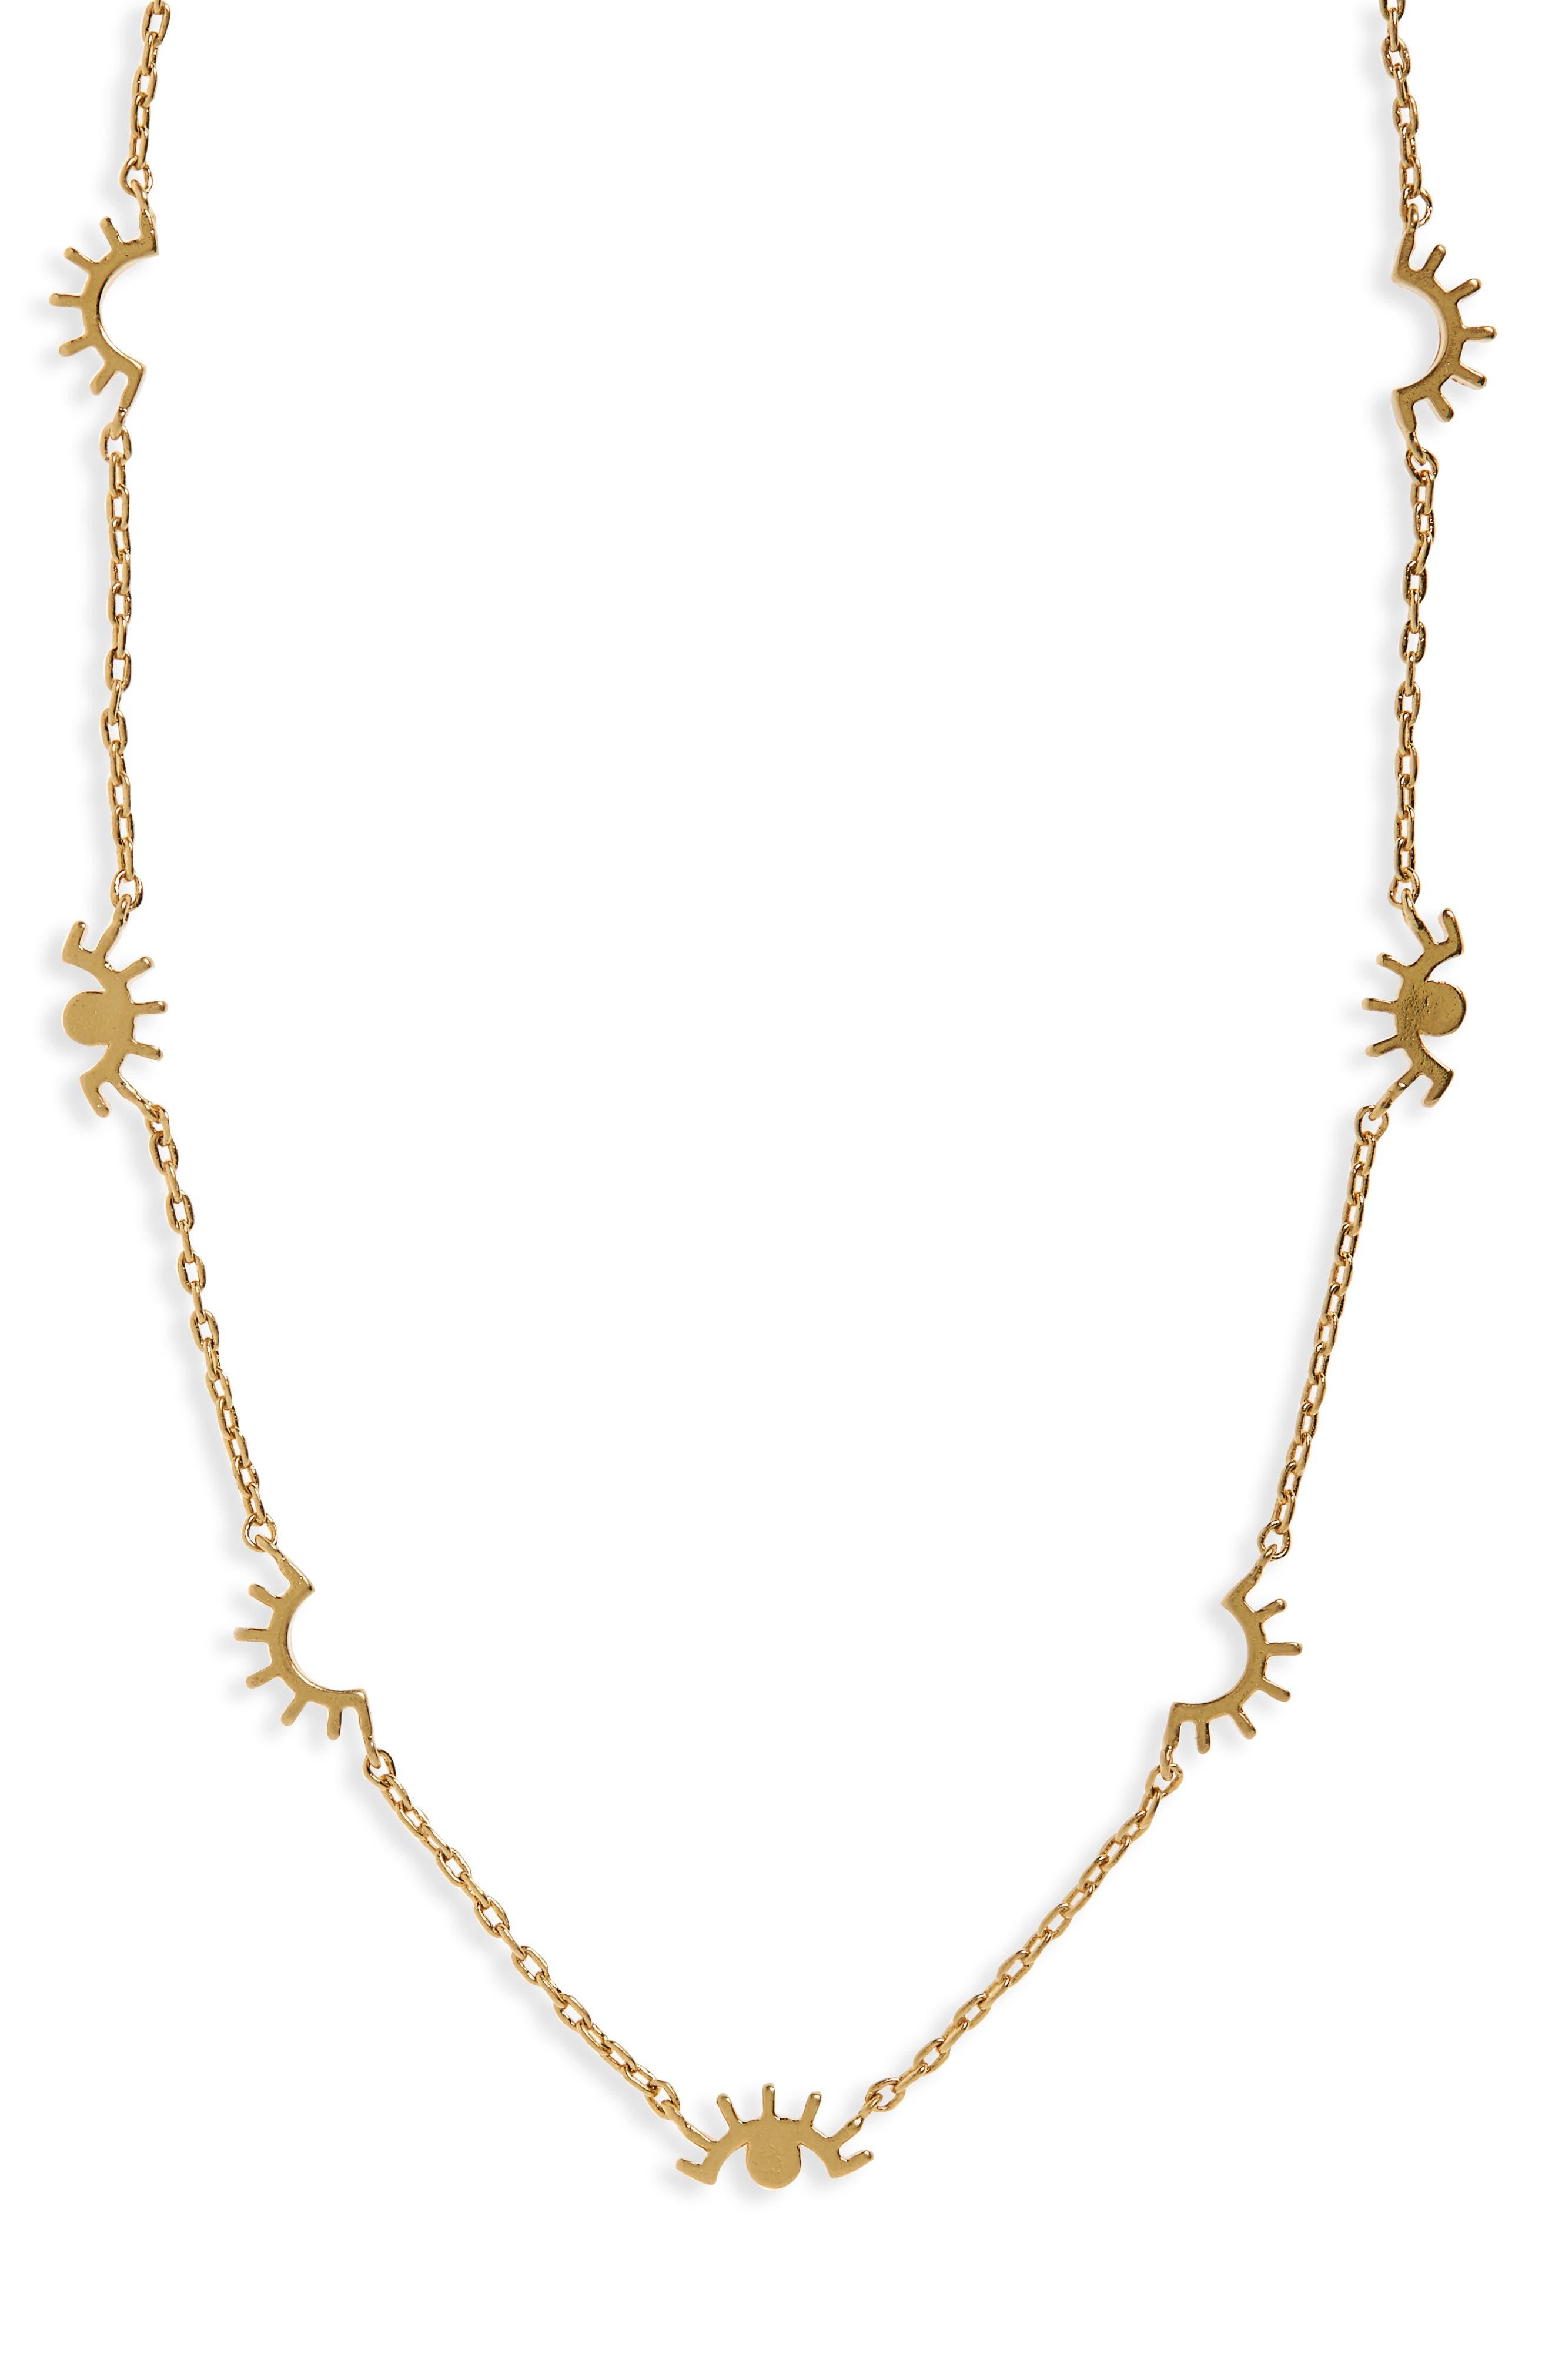 Eye Charm Necklace,                             Main thumbnail 1, color,                             Vintage Gold